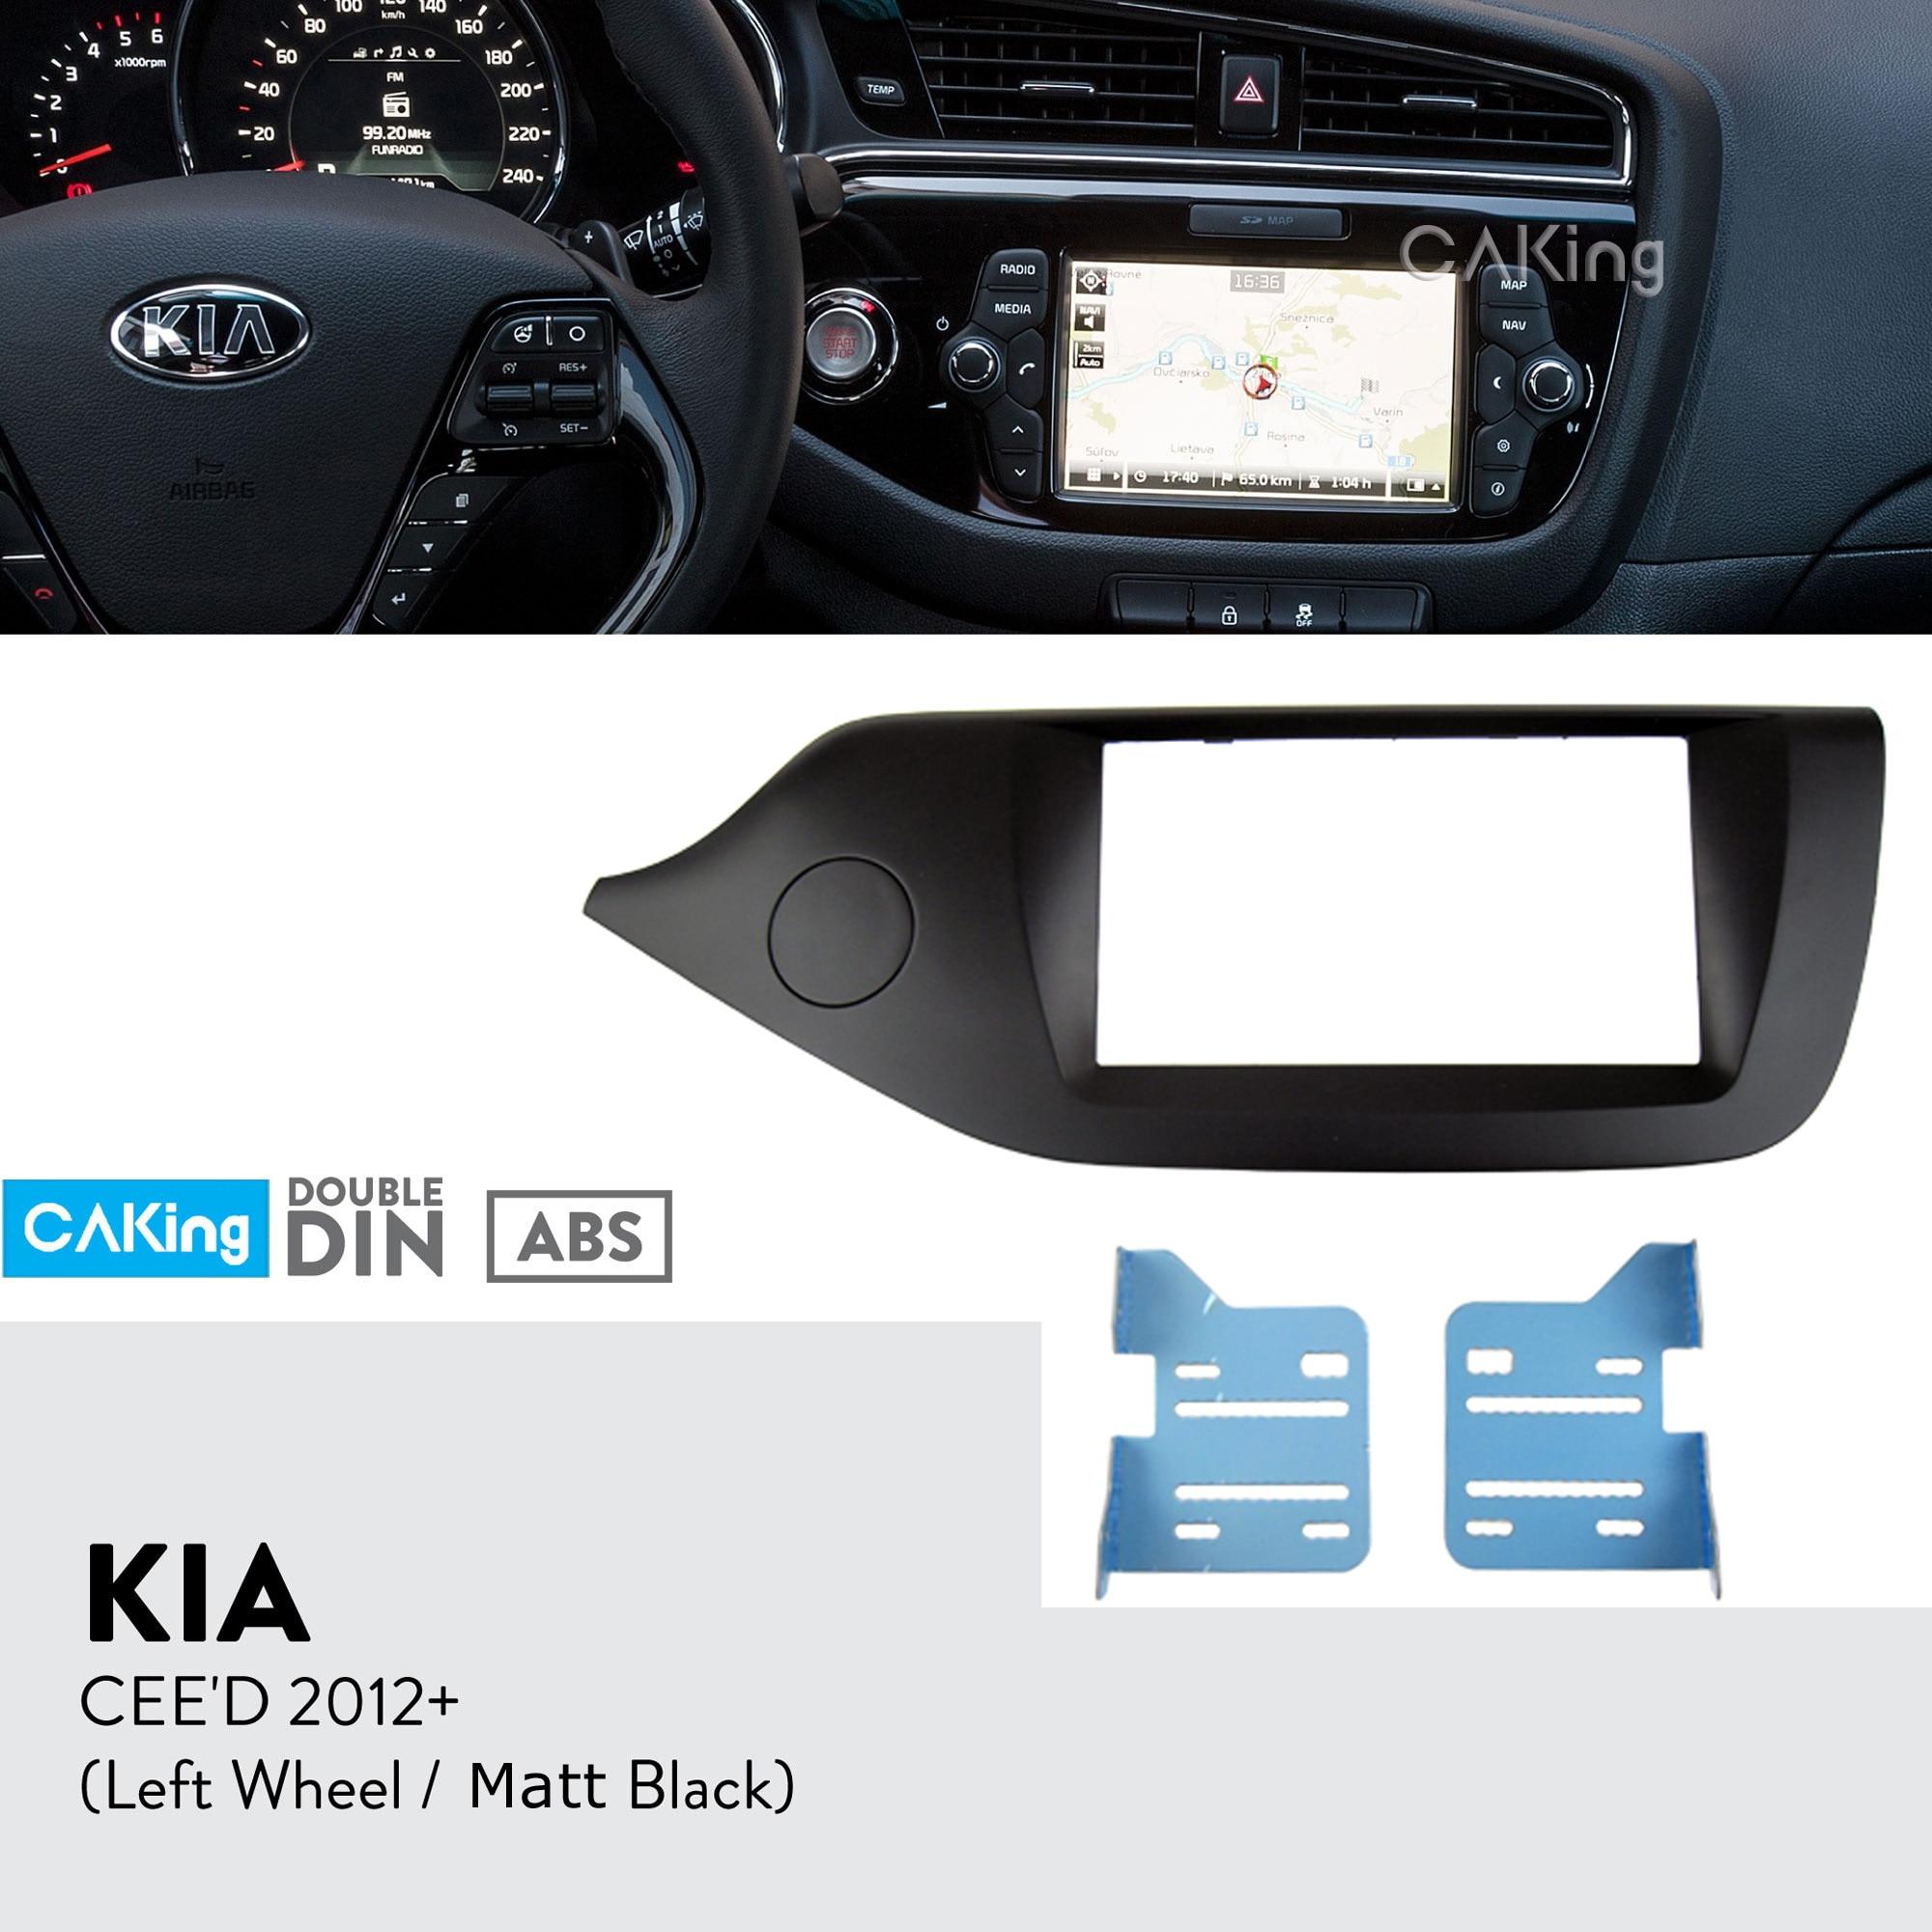 Double Din Car Fascia Radio Panel for KIA CEED 2012 Left Wheel Matt Black Dash Kit